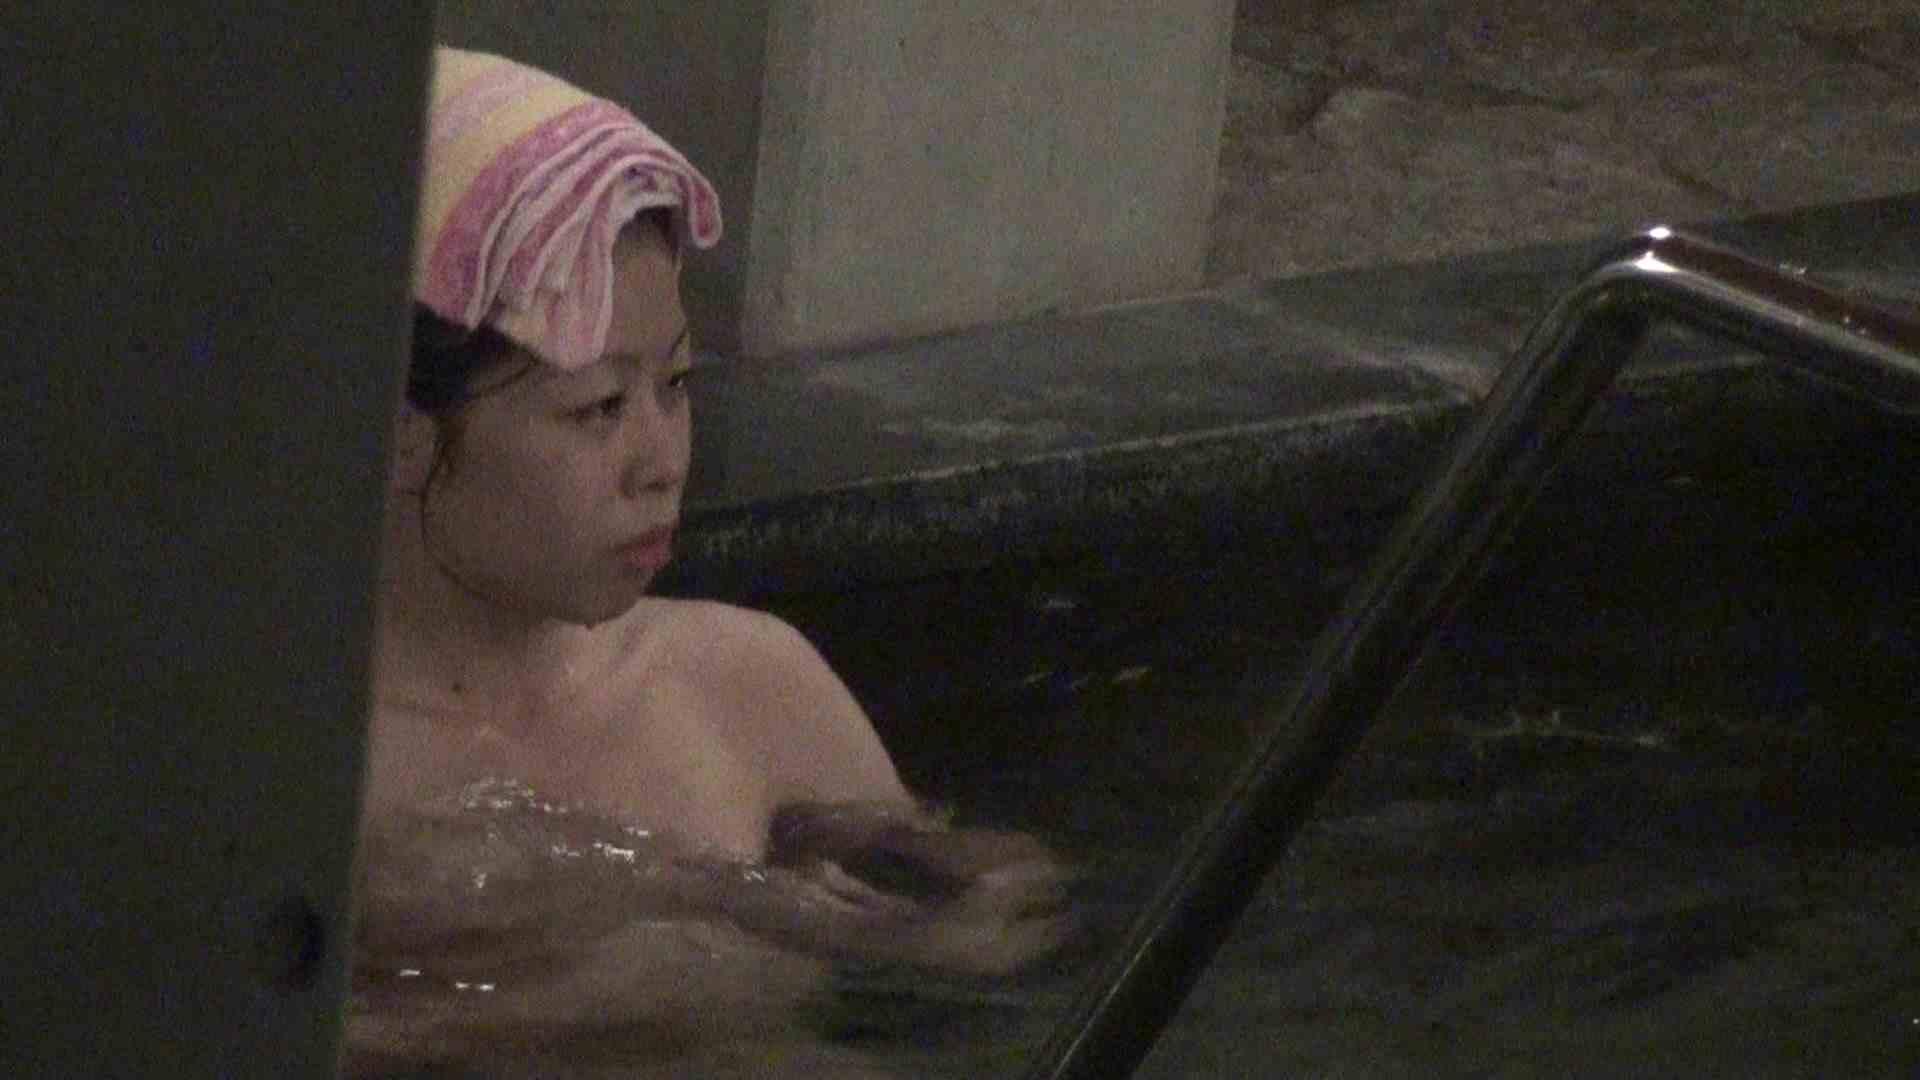 Aquaな露天風呂Vol.324 盗撮シリーズ | 露天風呂編  109PIX 81